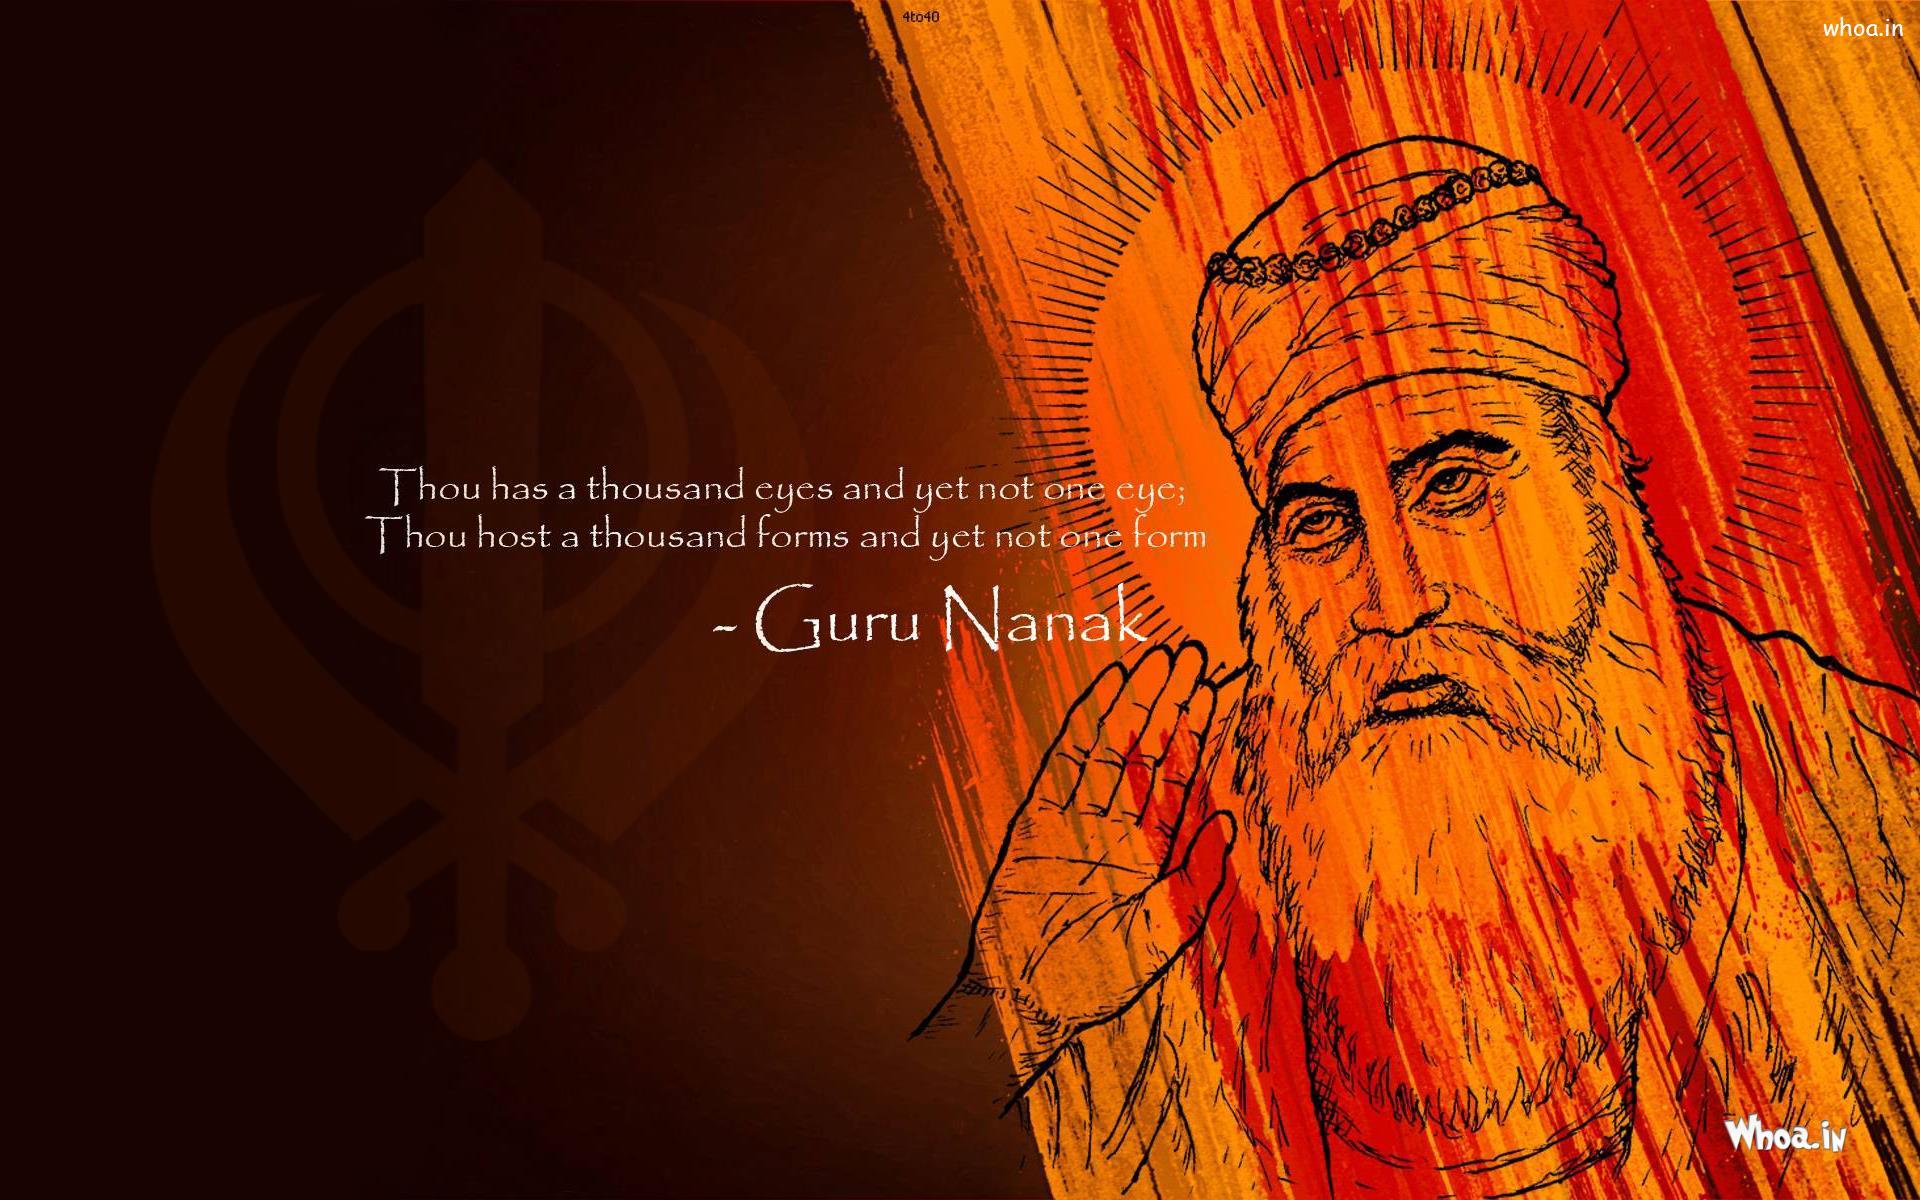 Whoa - In Logo - Quotes Guru Nanak Gurpurab - HD Wallpaper